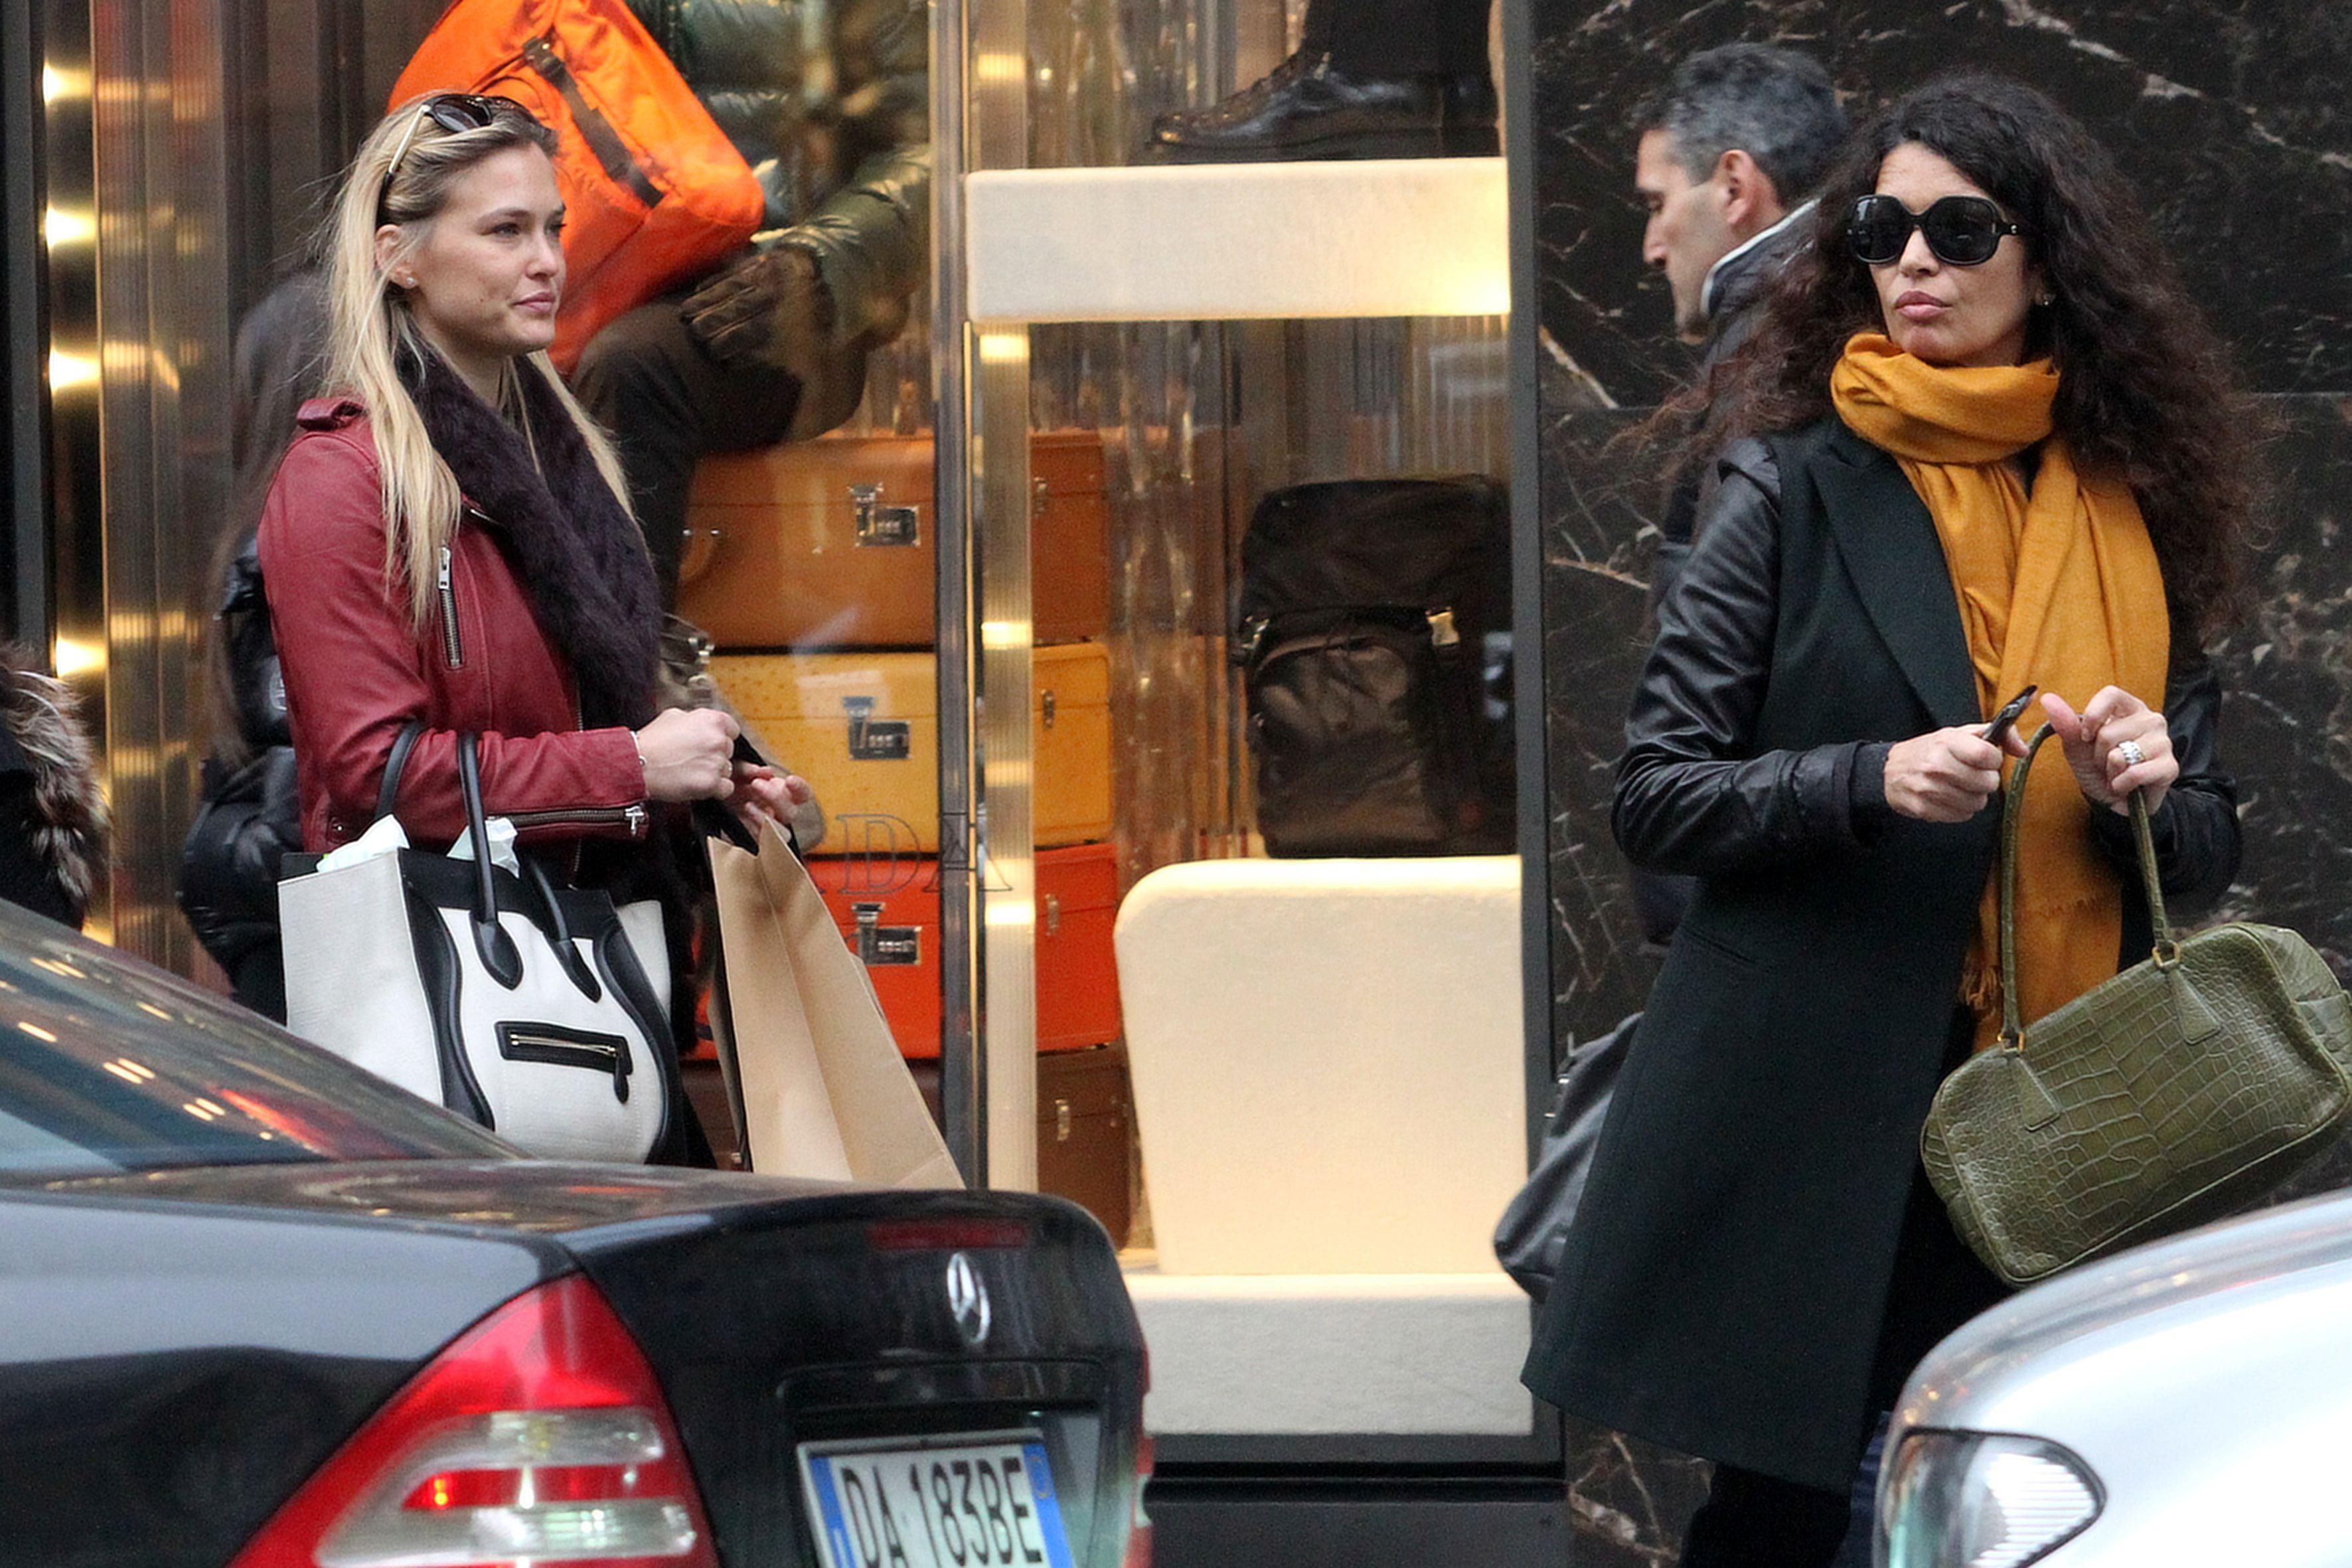 88427_Preppie_Bar_Refaeli_at_The_Pirelli_Store_in_Milan_1_122_426lo.JPG